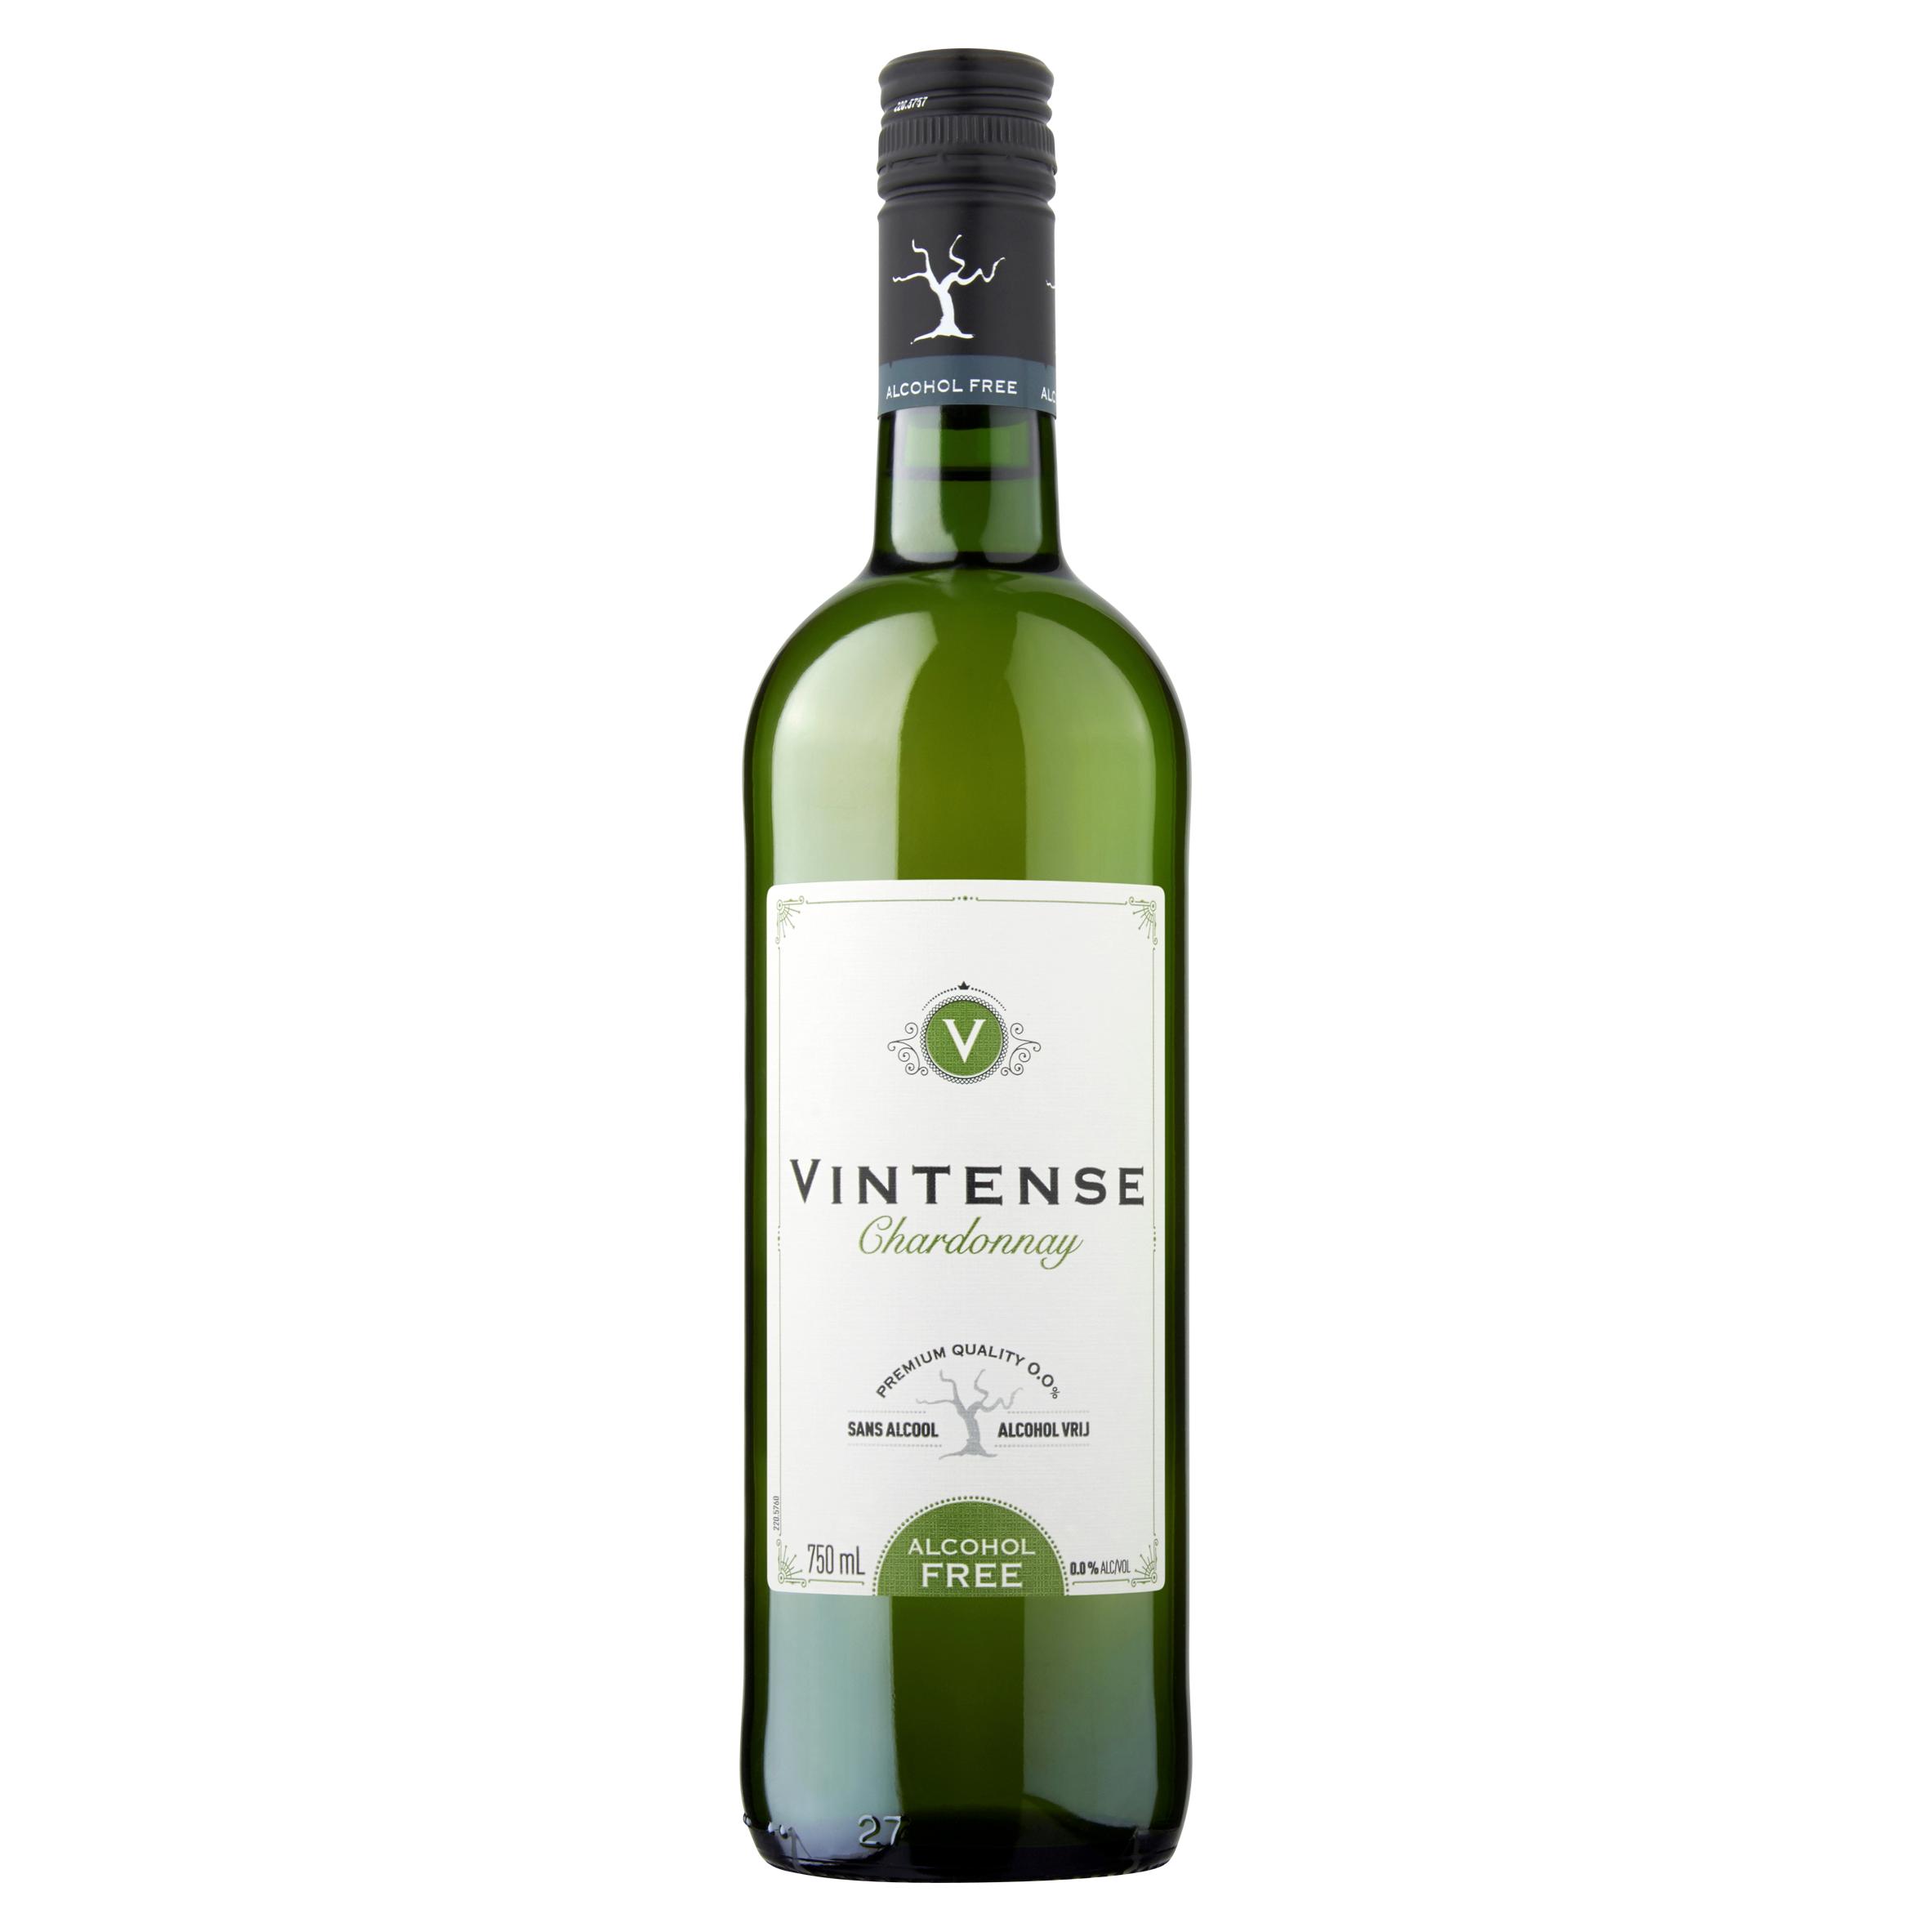 Vintense Chardonnay Alcoholvrij 750 ml